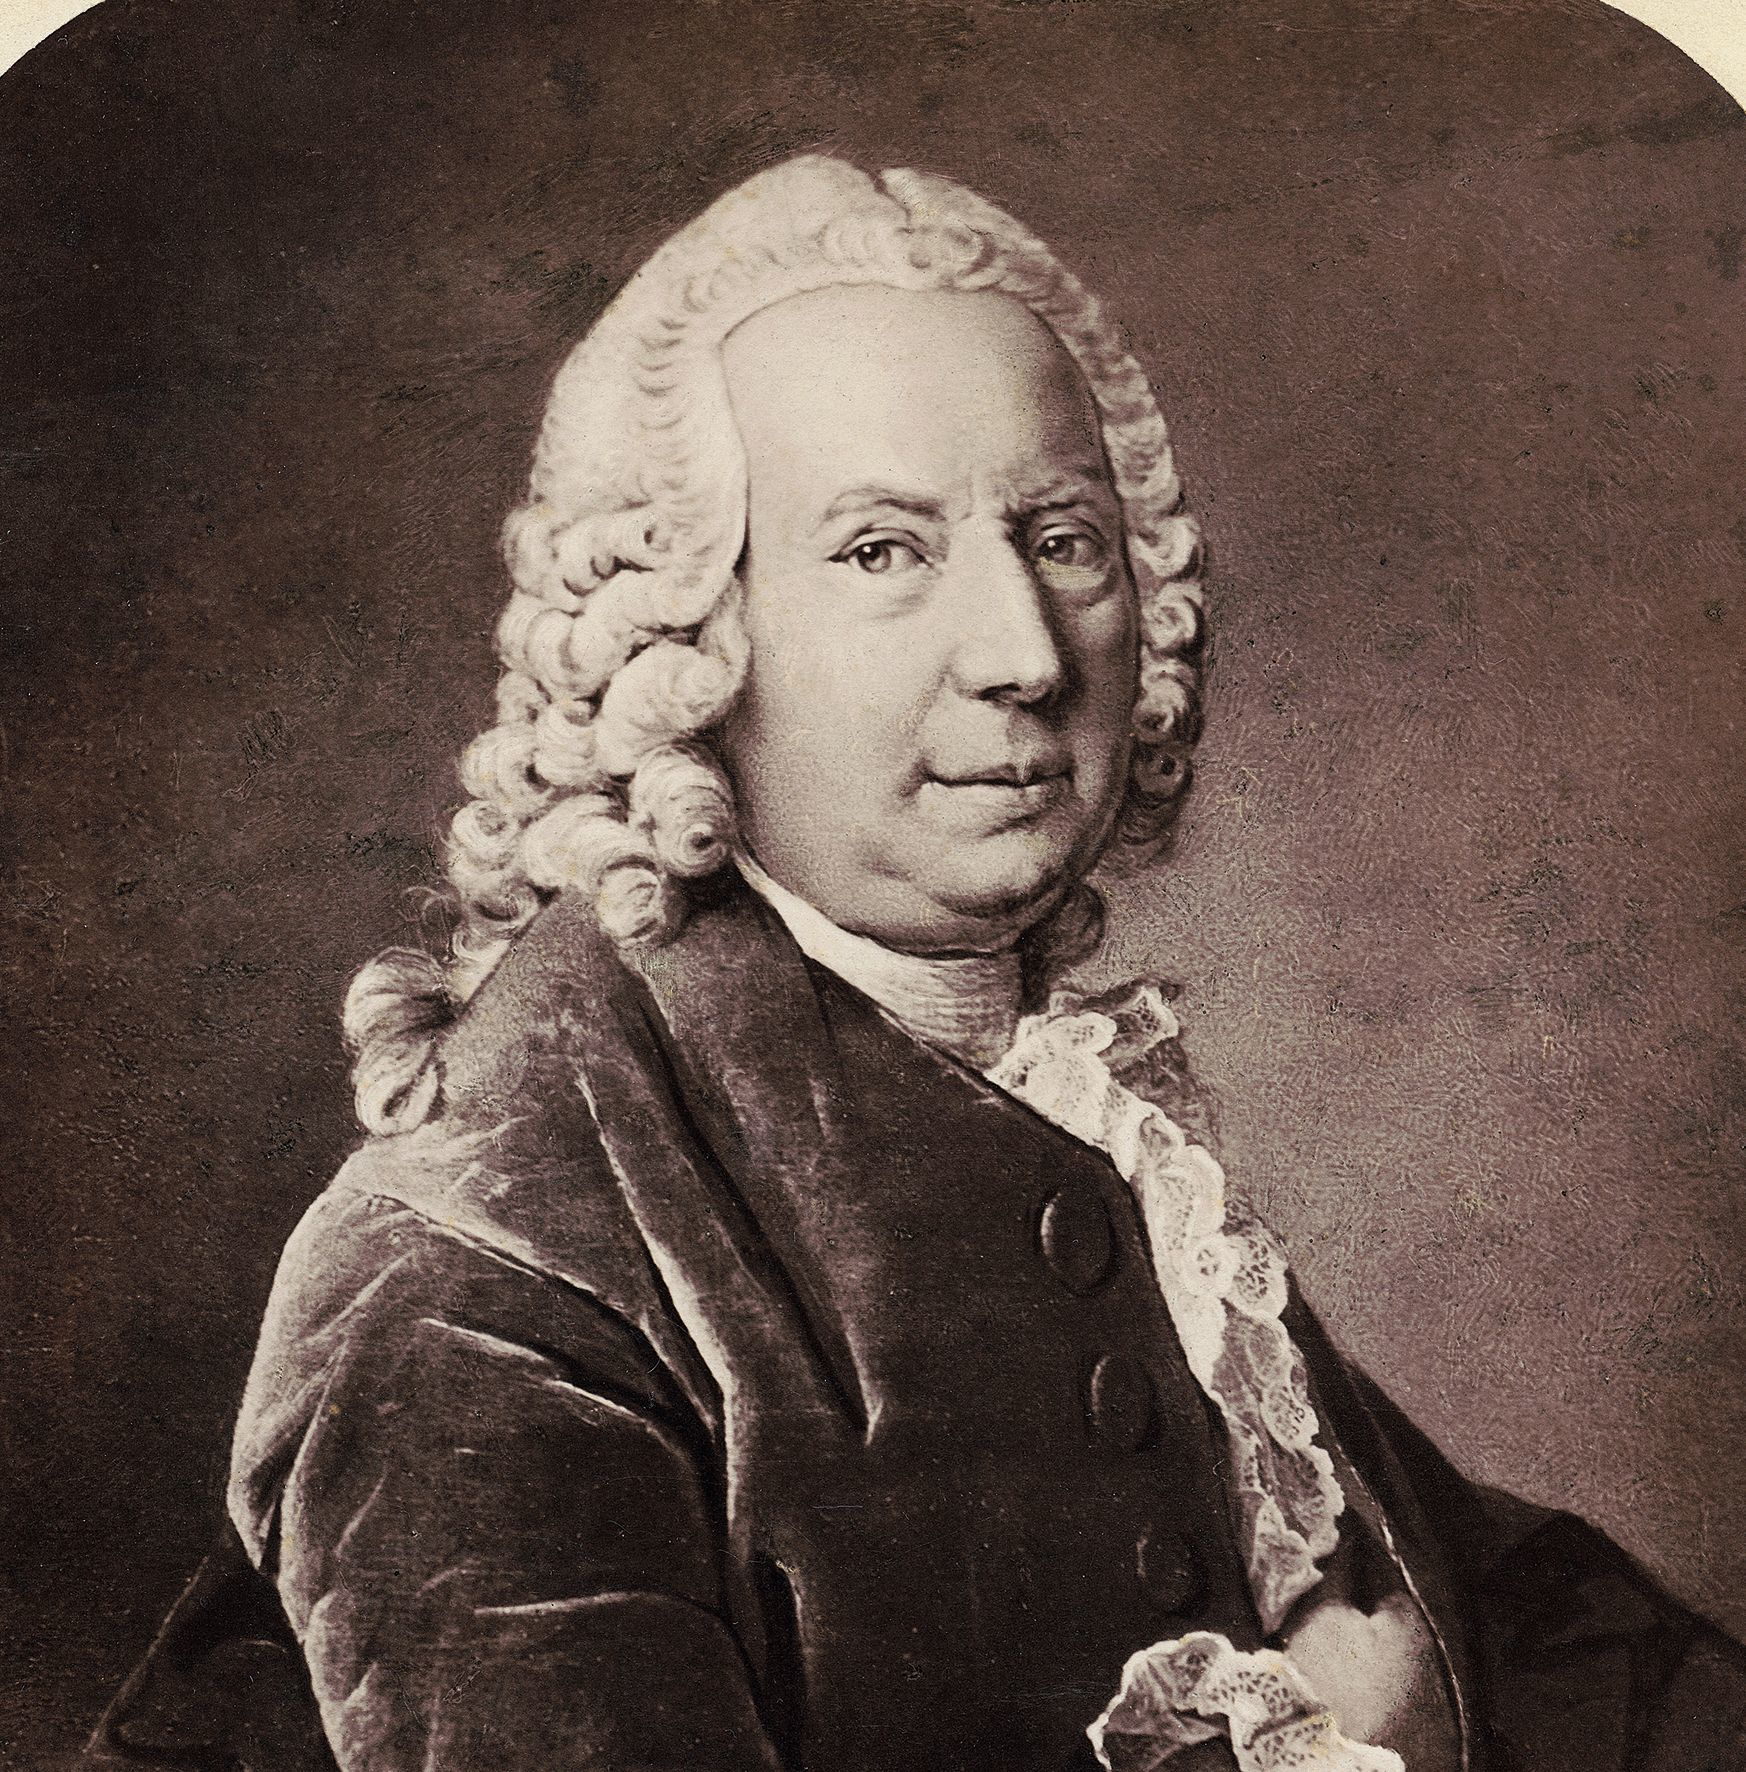 Daniel Bernouilli